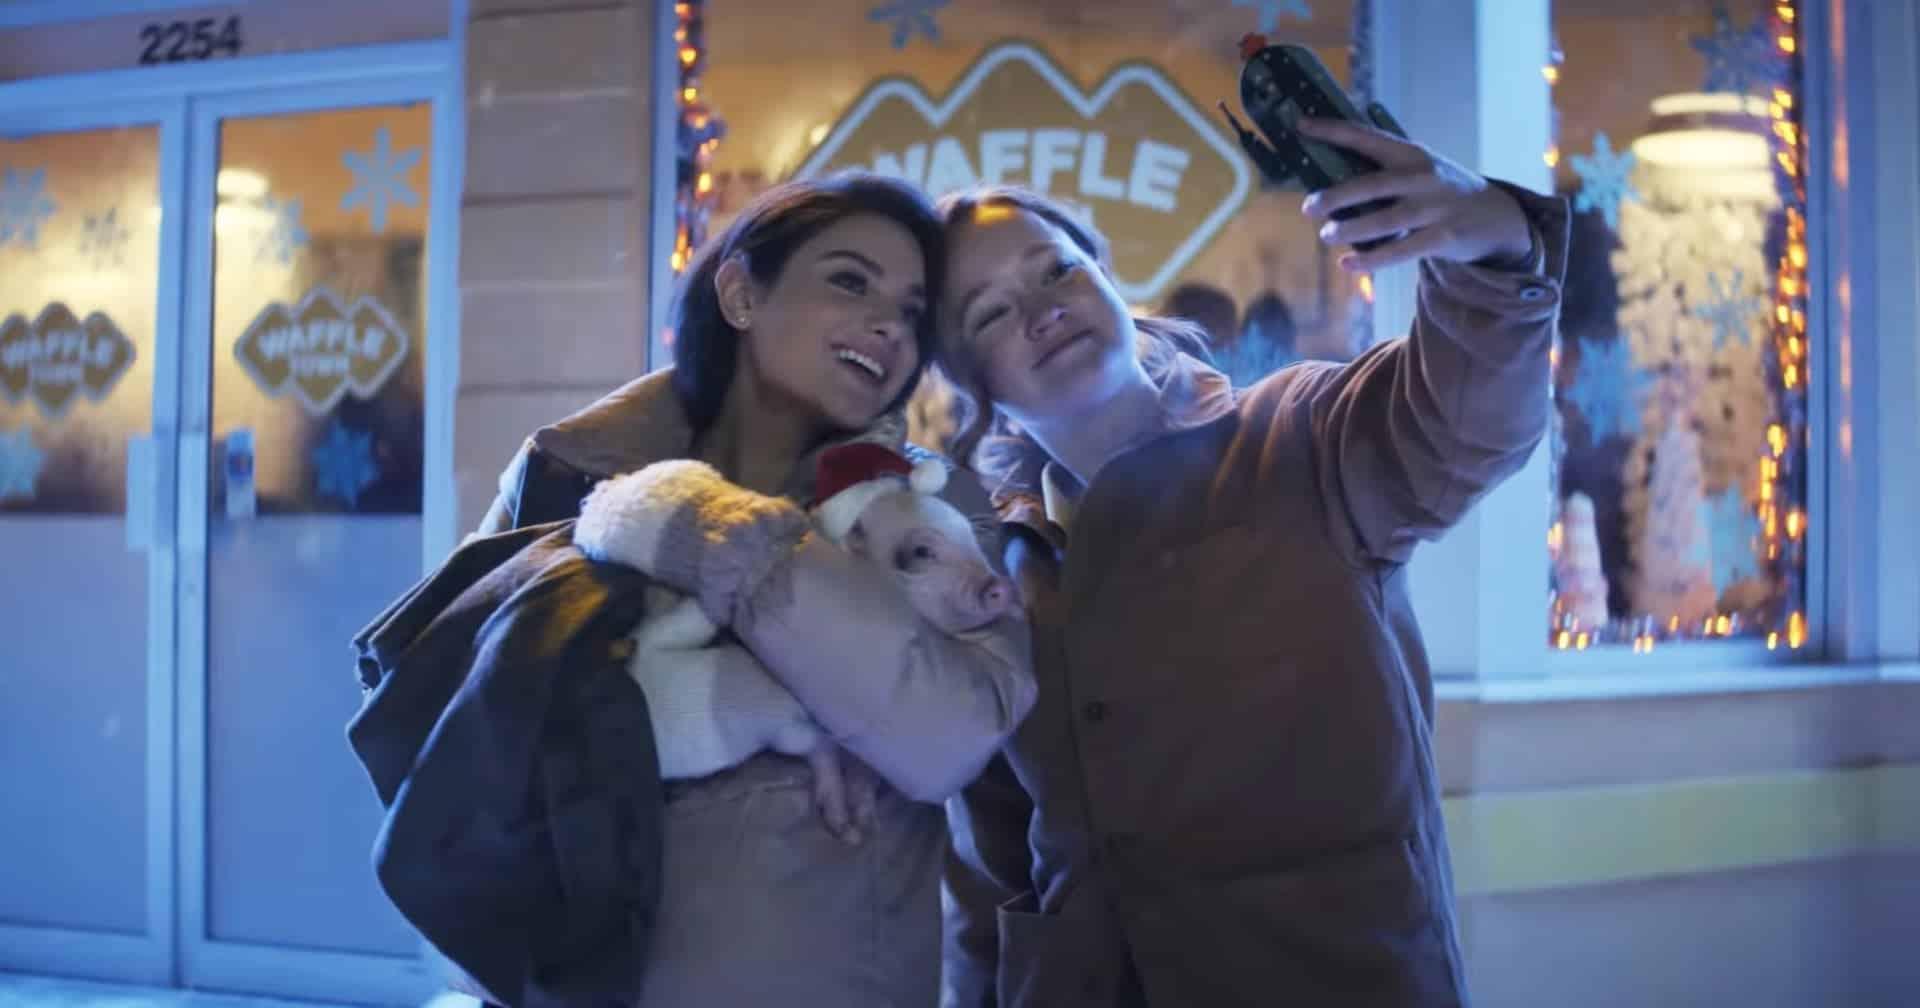 Let it snow: Innamorarsi sotto la neve: recensione del film Netflix